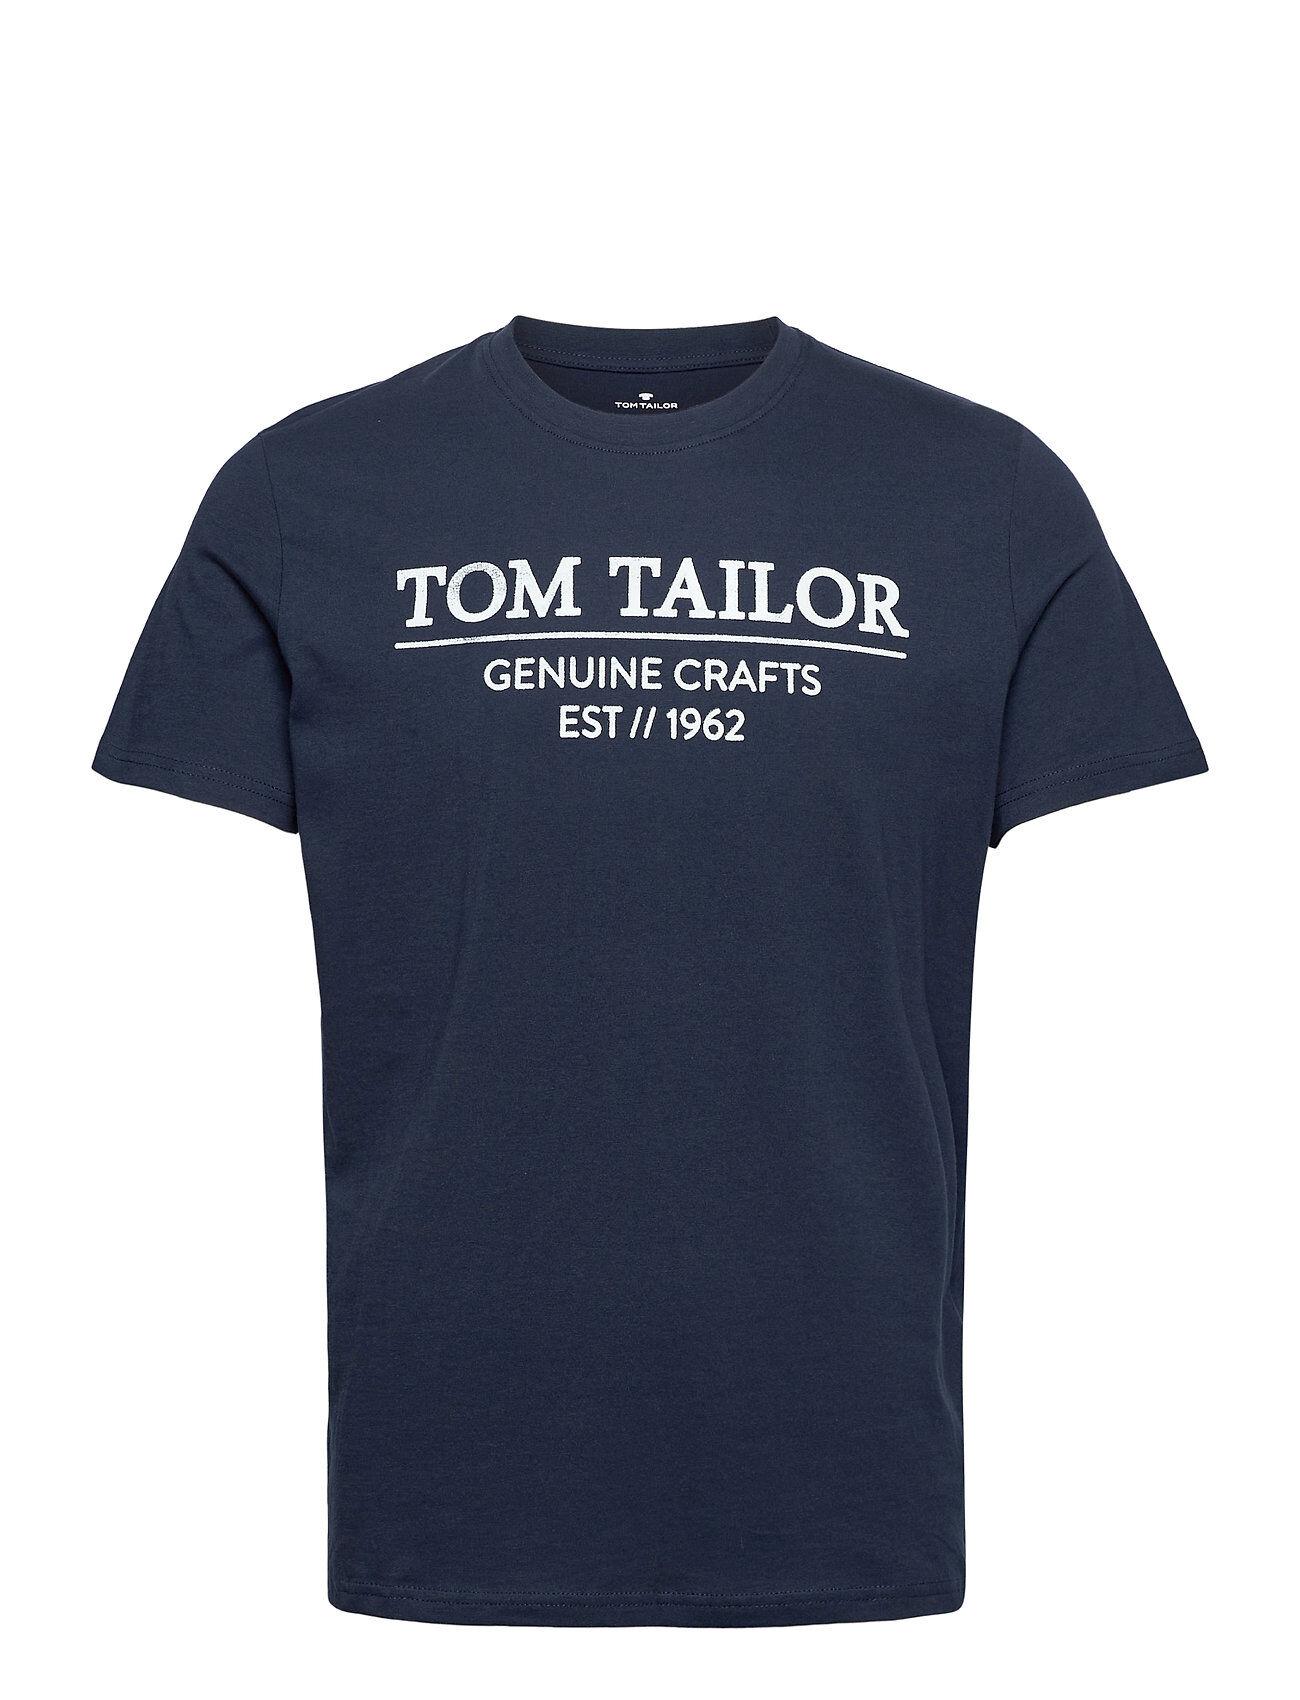 Tom Tailor T-Shirt With T-shirts Short-sleeved Sininen Tom Tailor